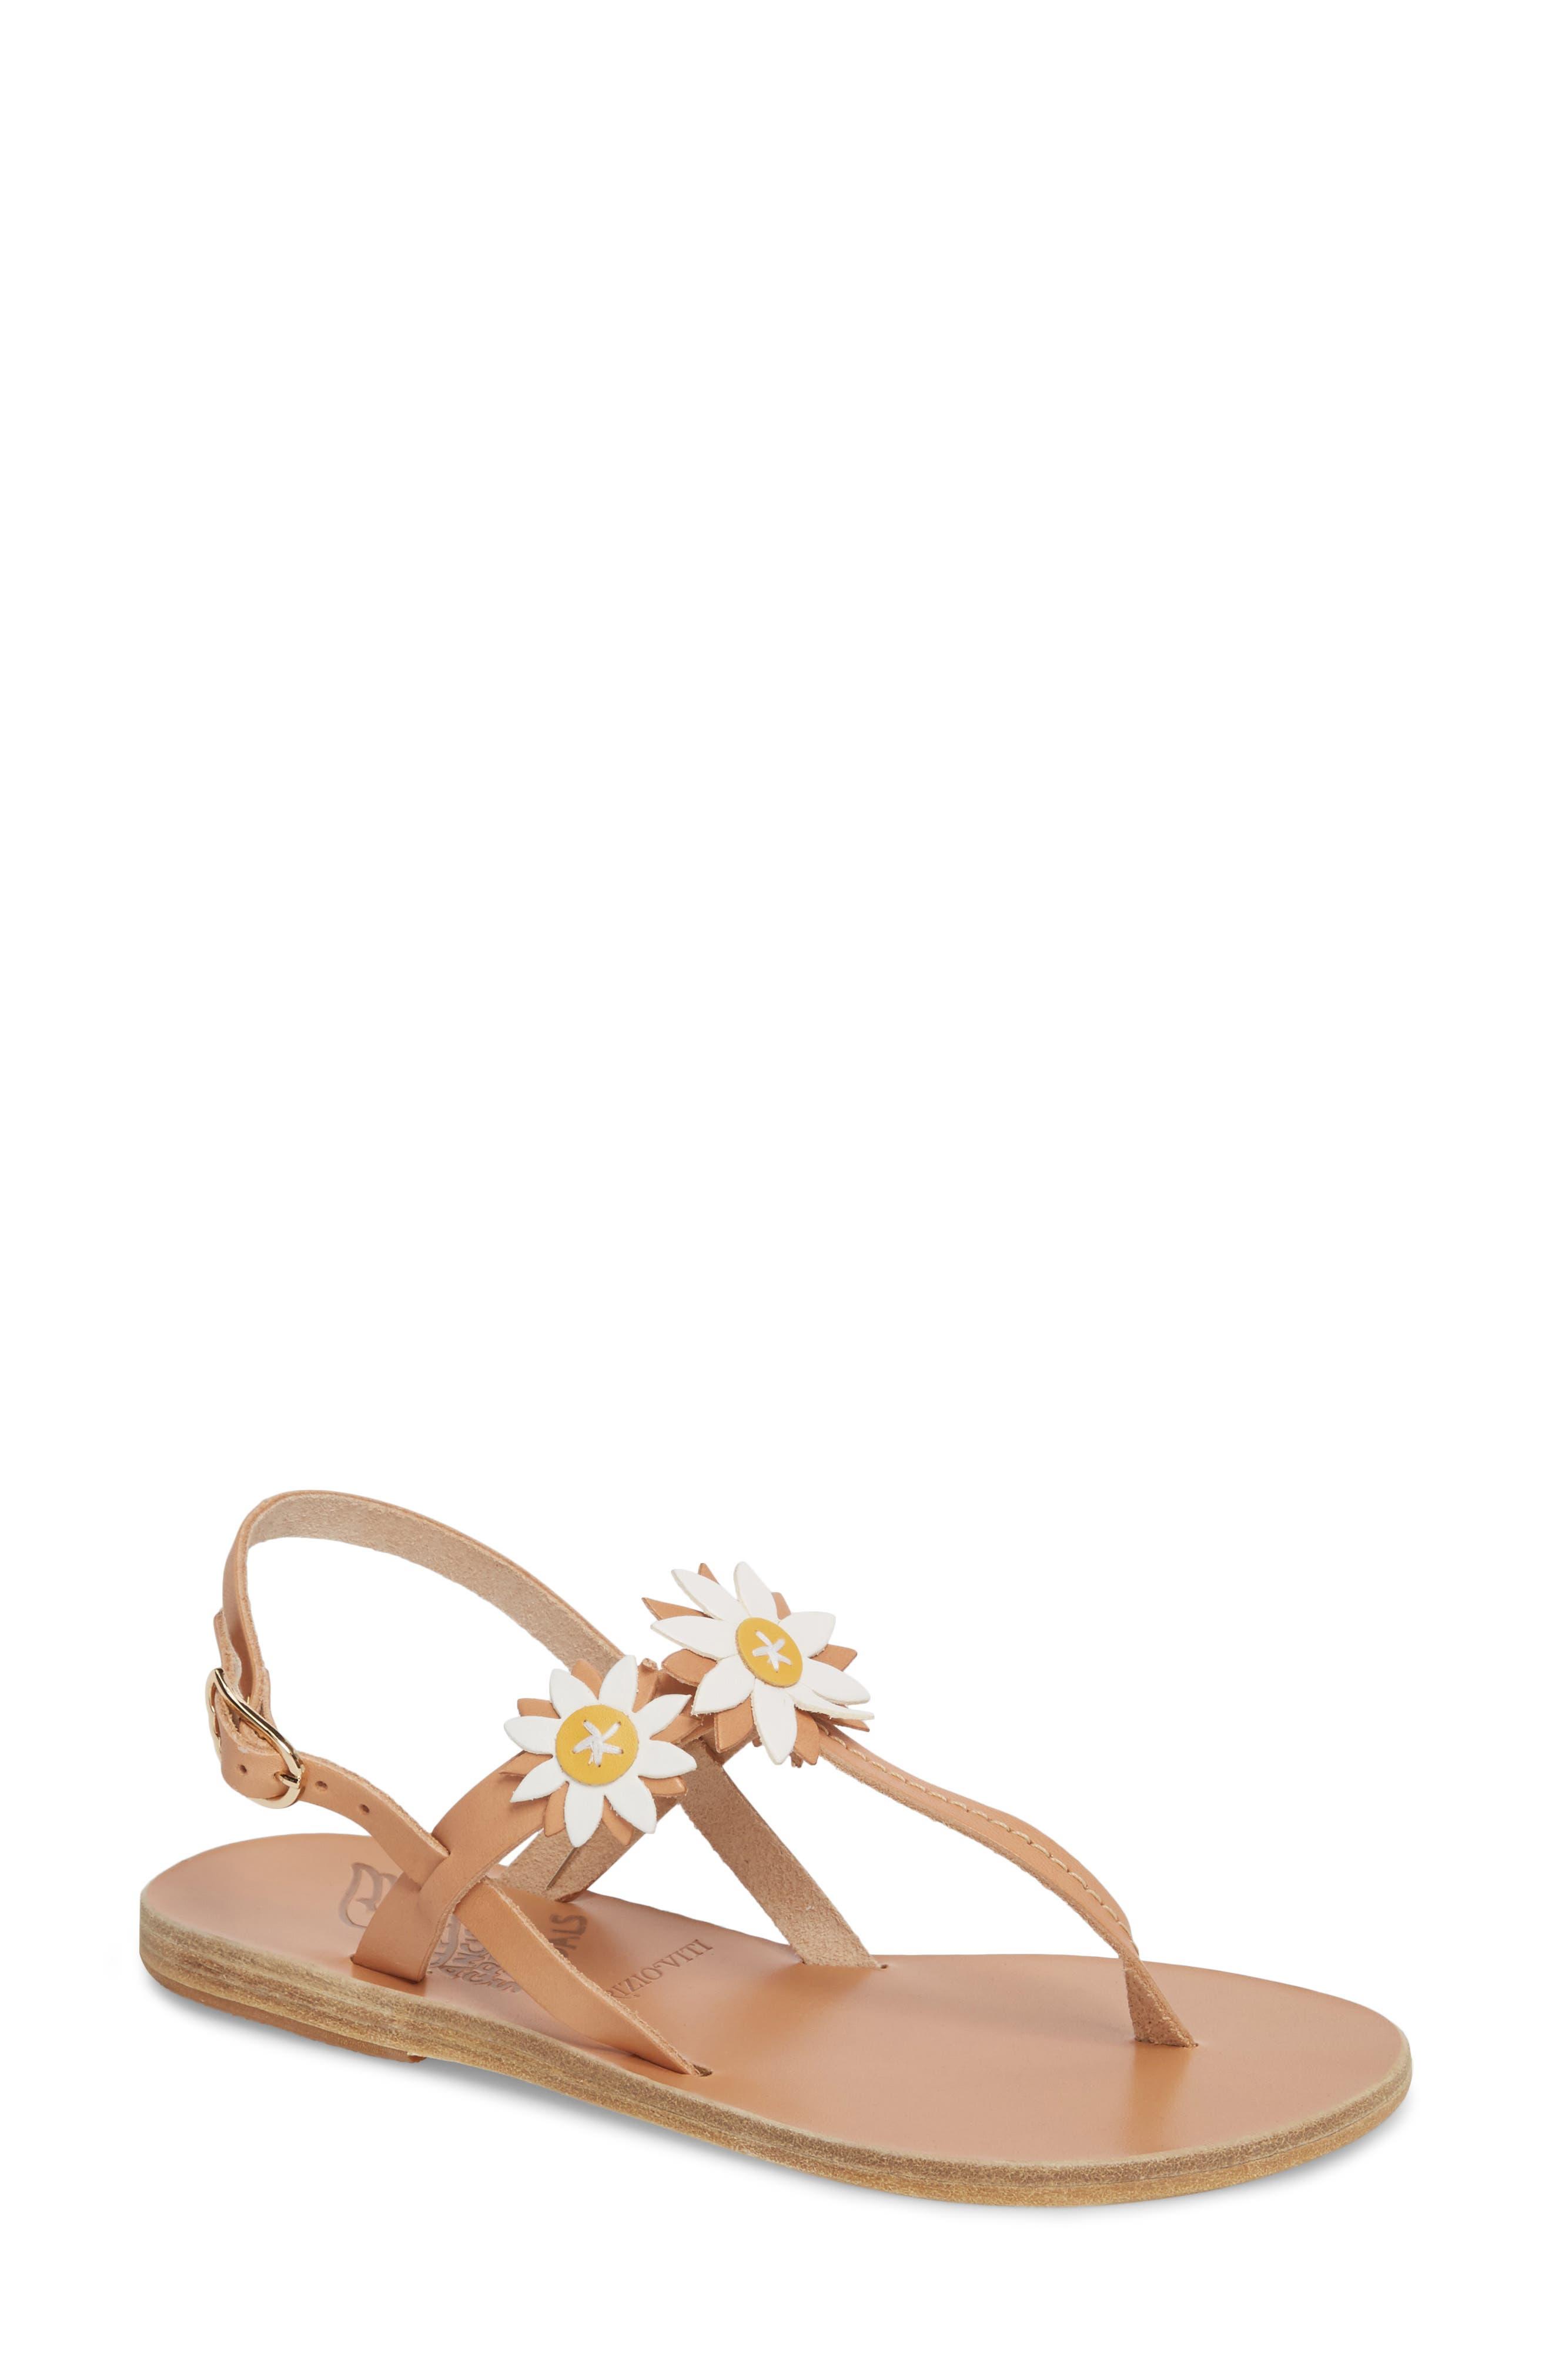 Alternate Image 1 Selected - Ancient Greek Sandals Sylvie Sandal (Women)